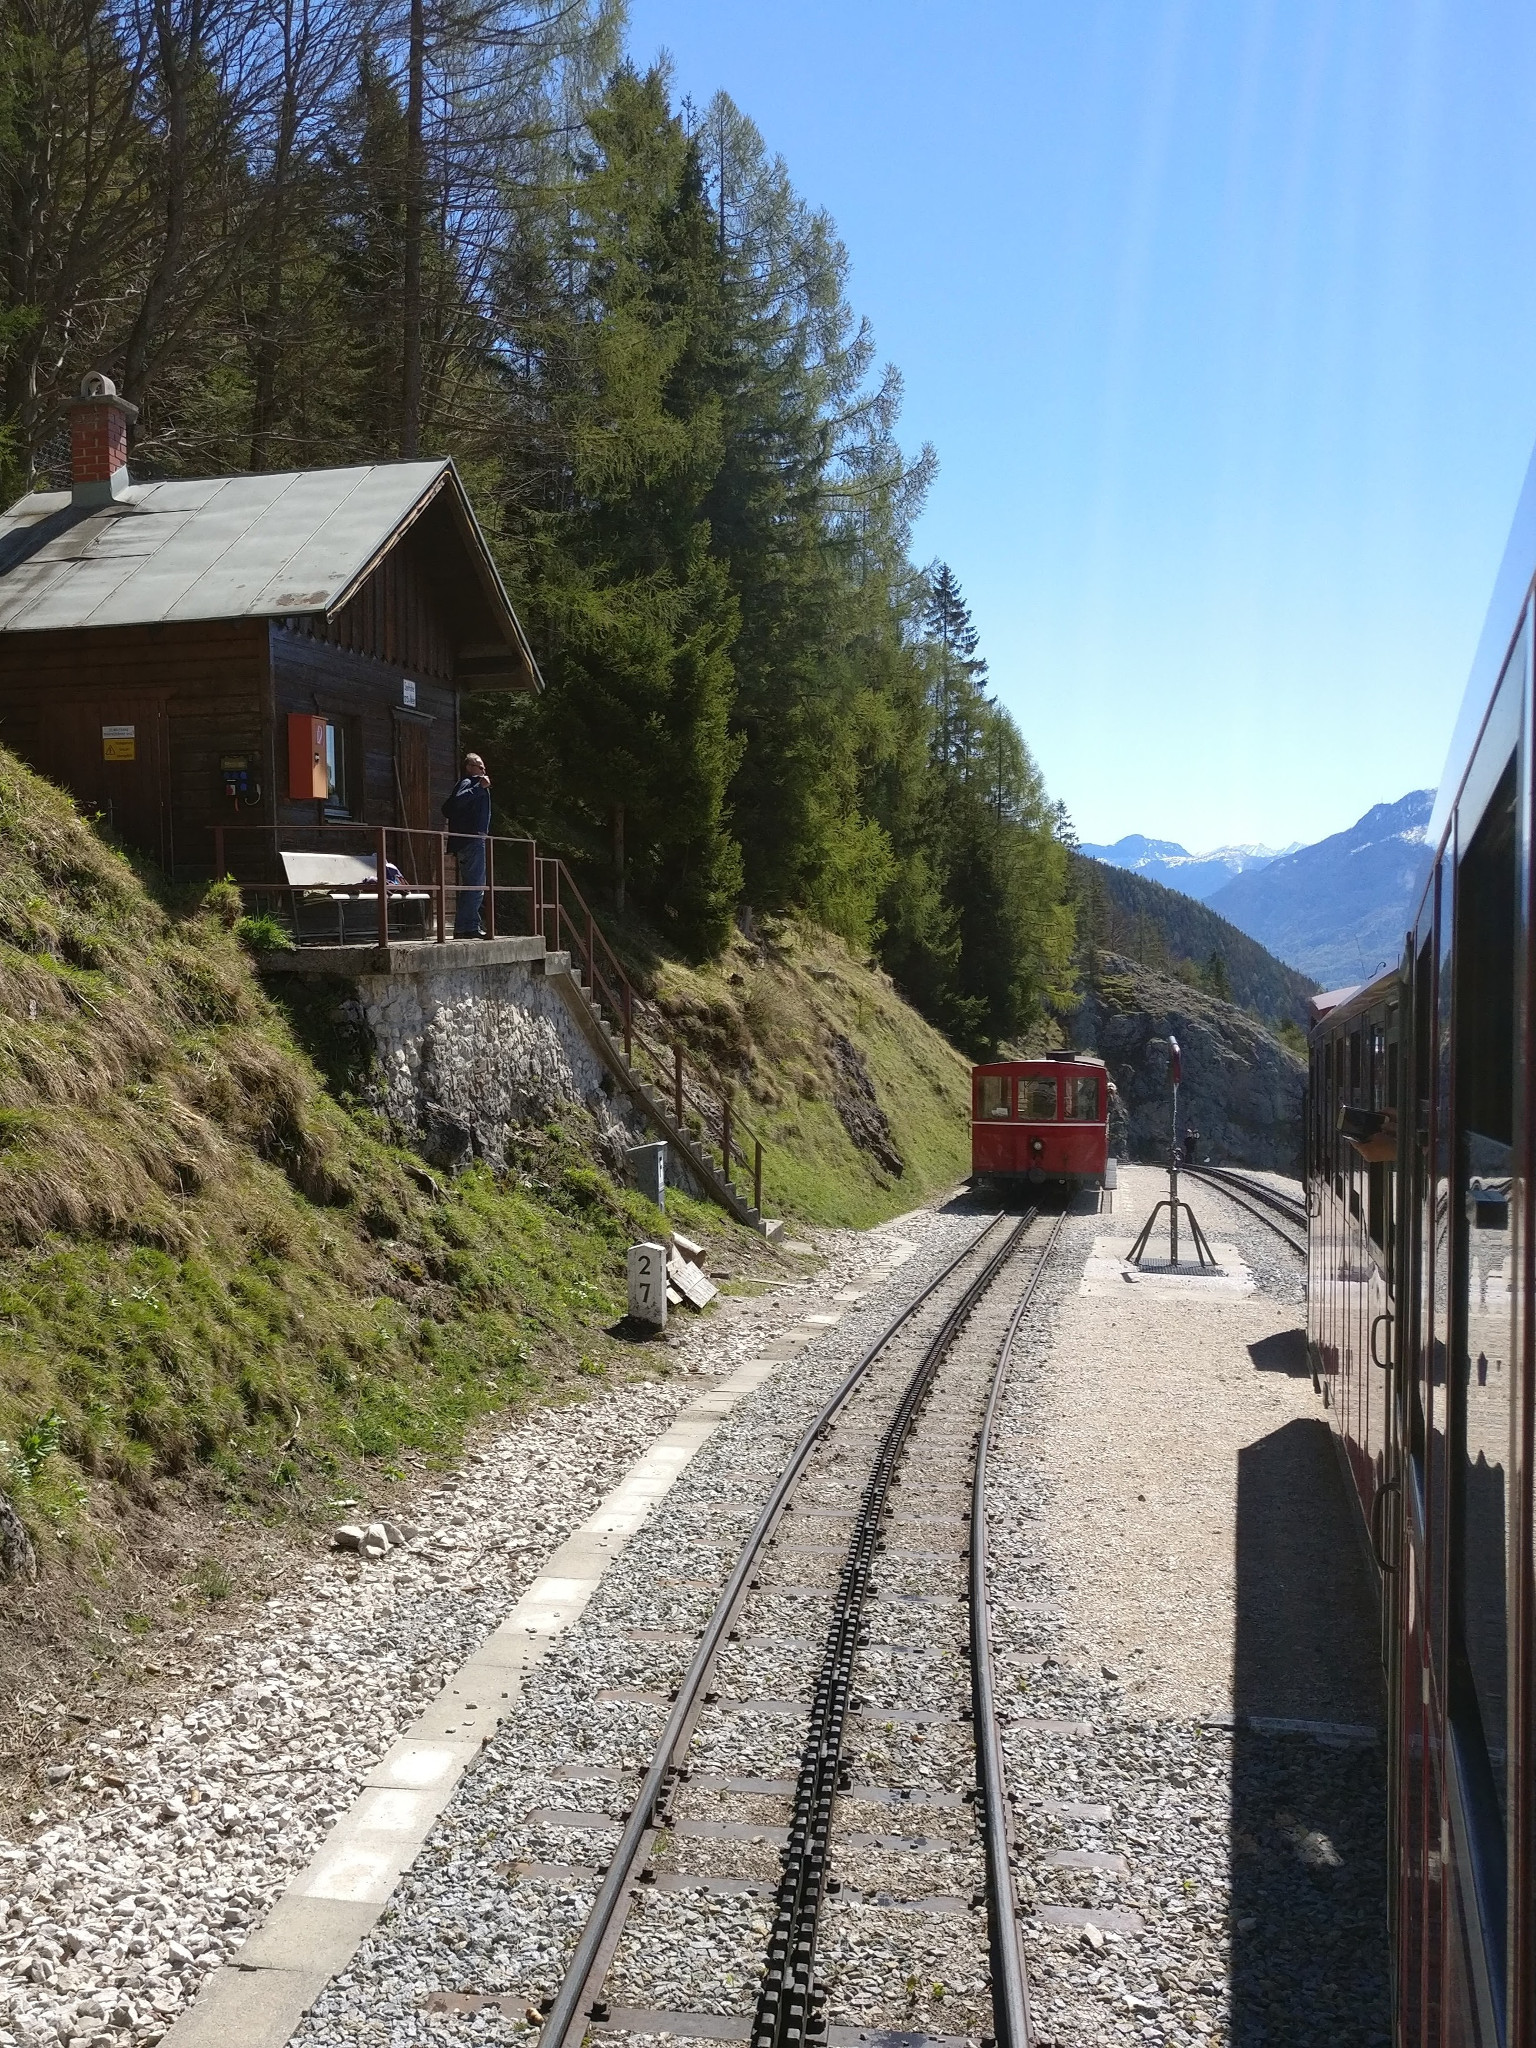 Schafbergbahn trains crossing